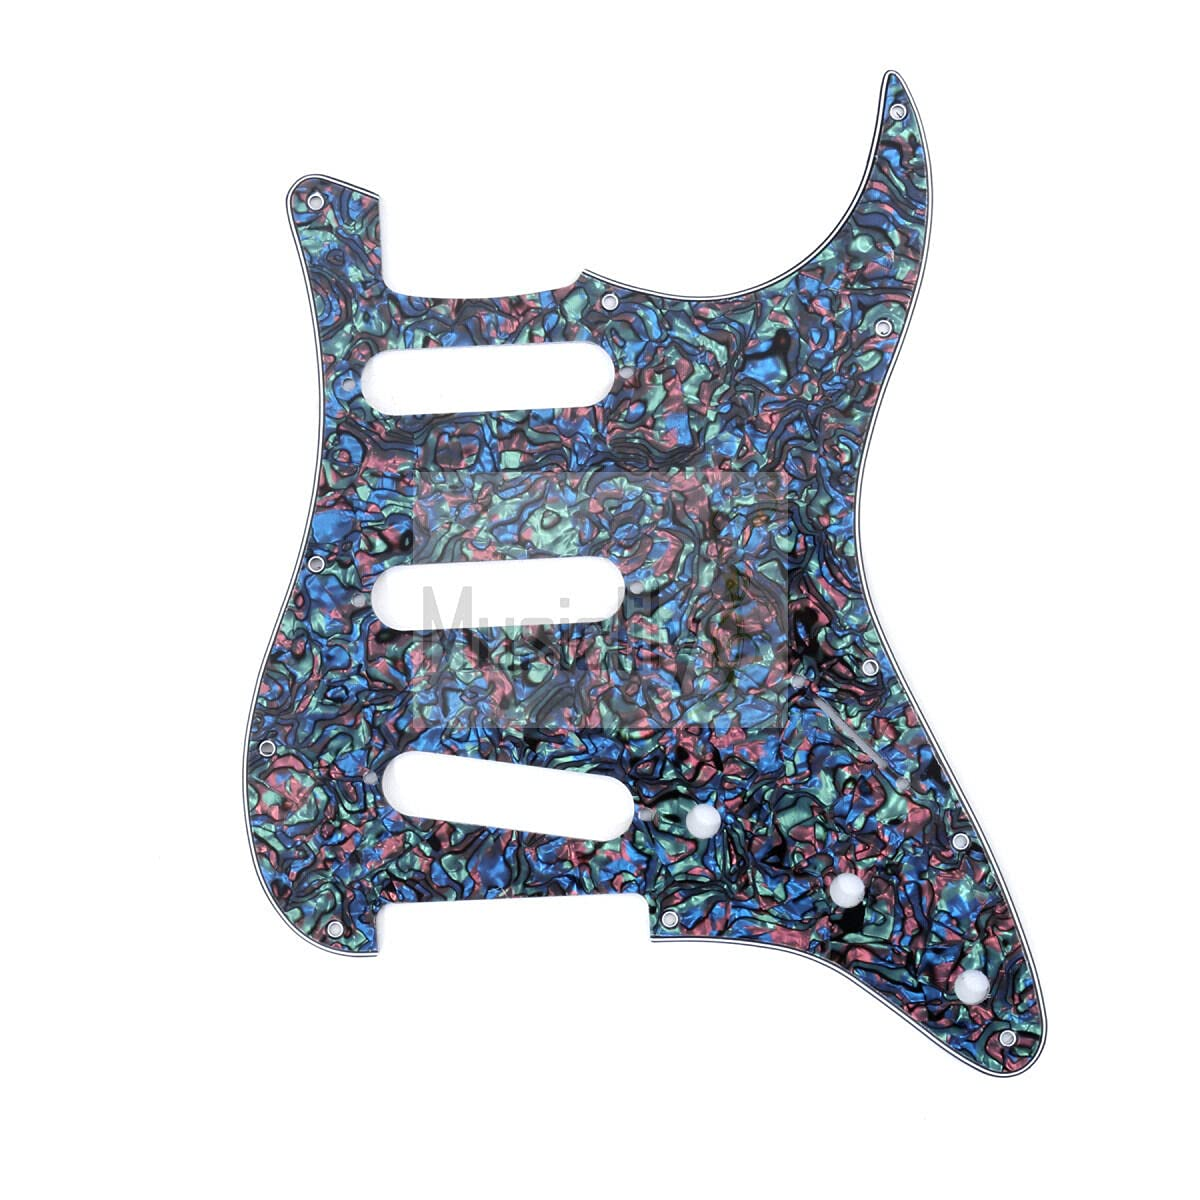 Guitar Max 70% OFF Parts for SSS Pickguard shipfree Stratocaster Fender Standard